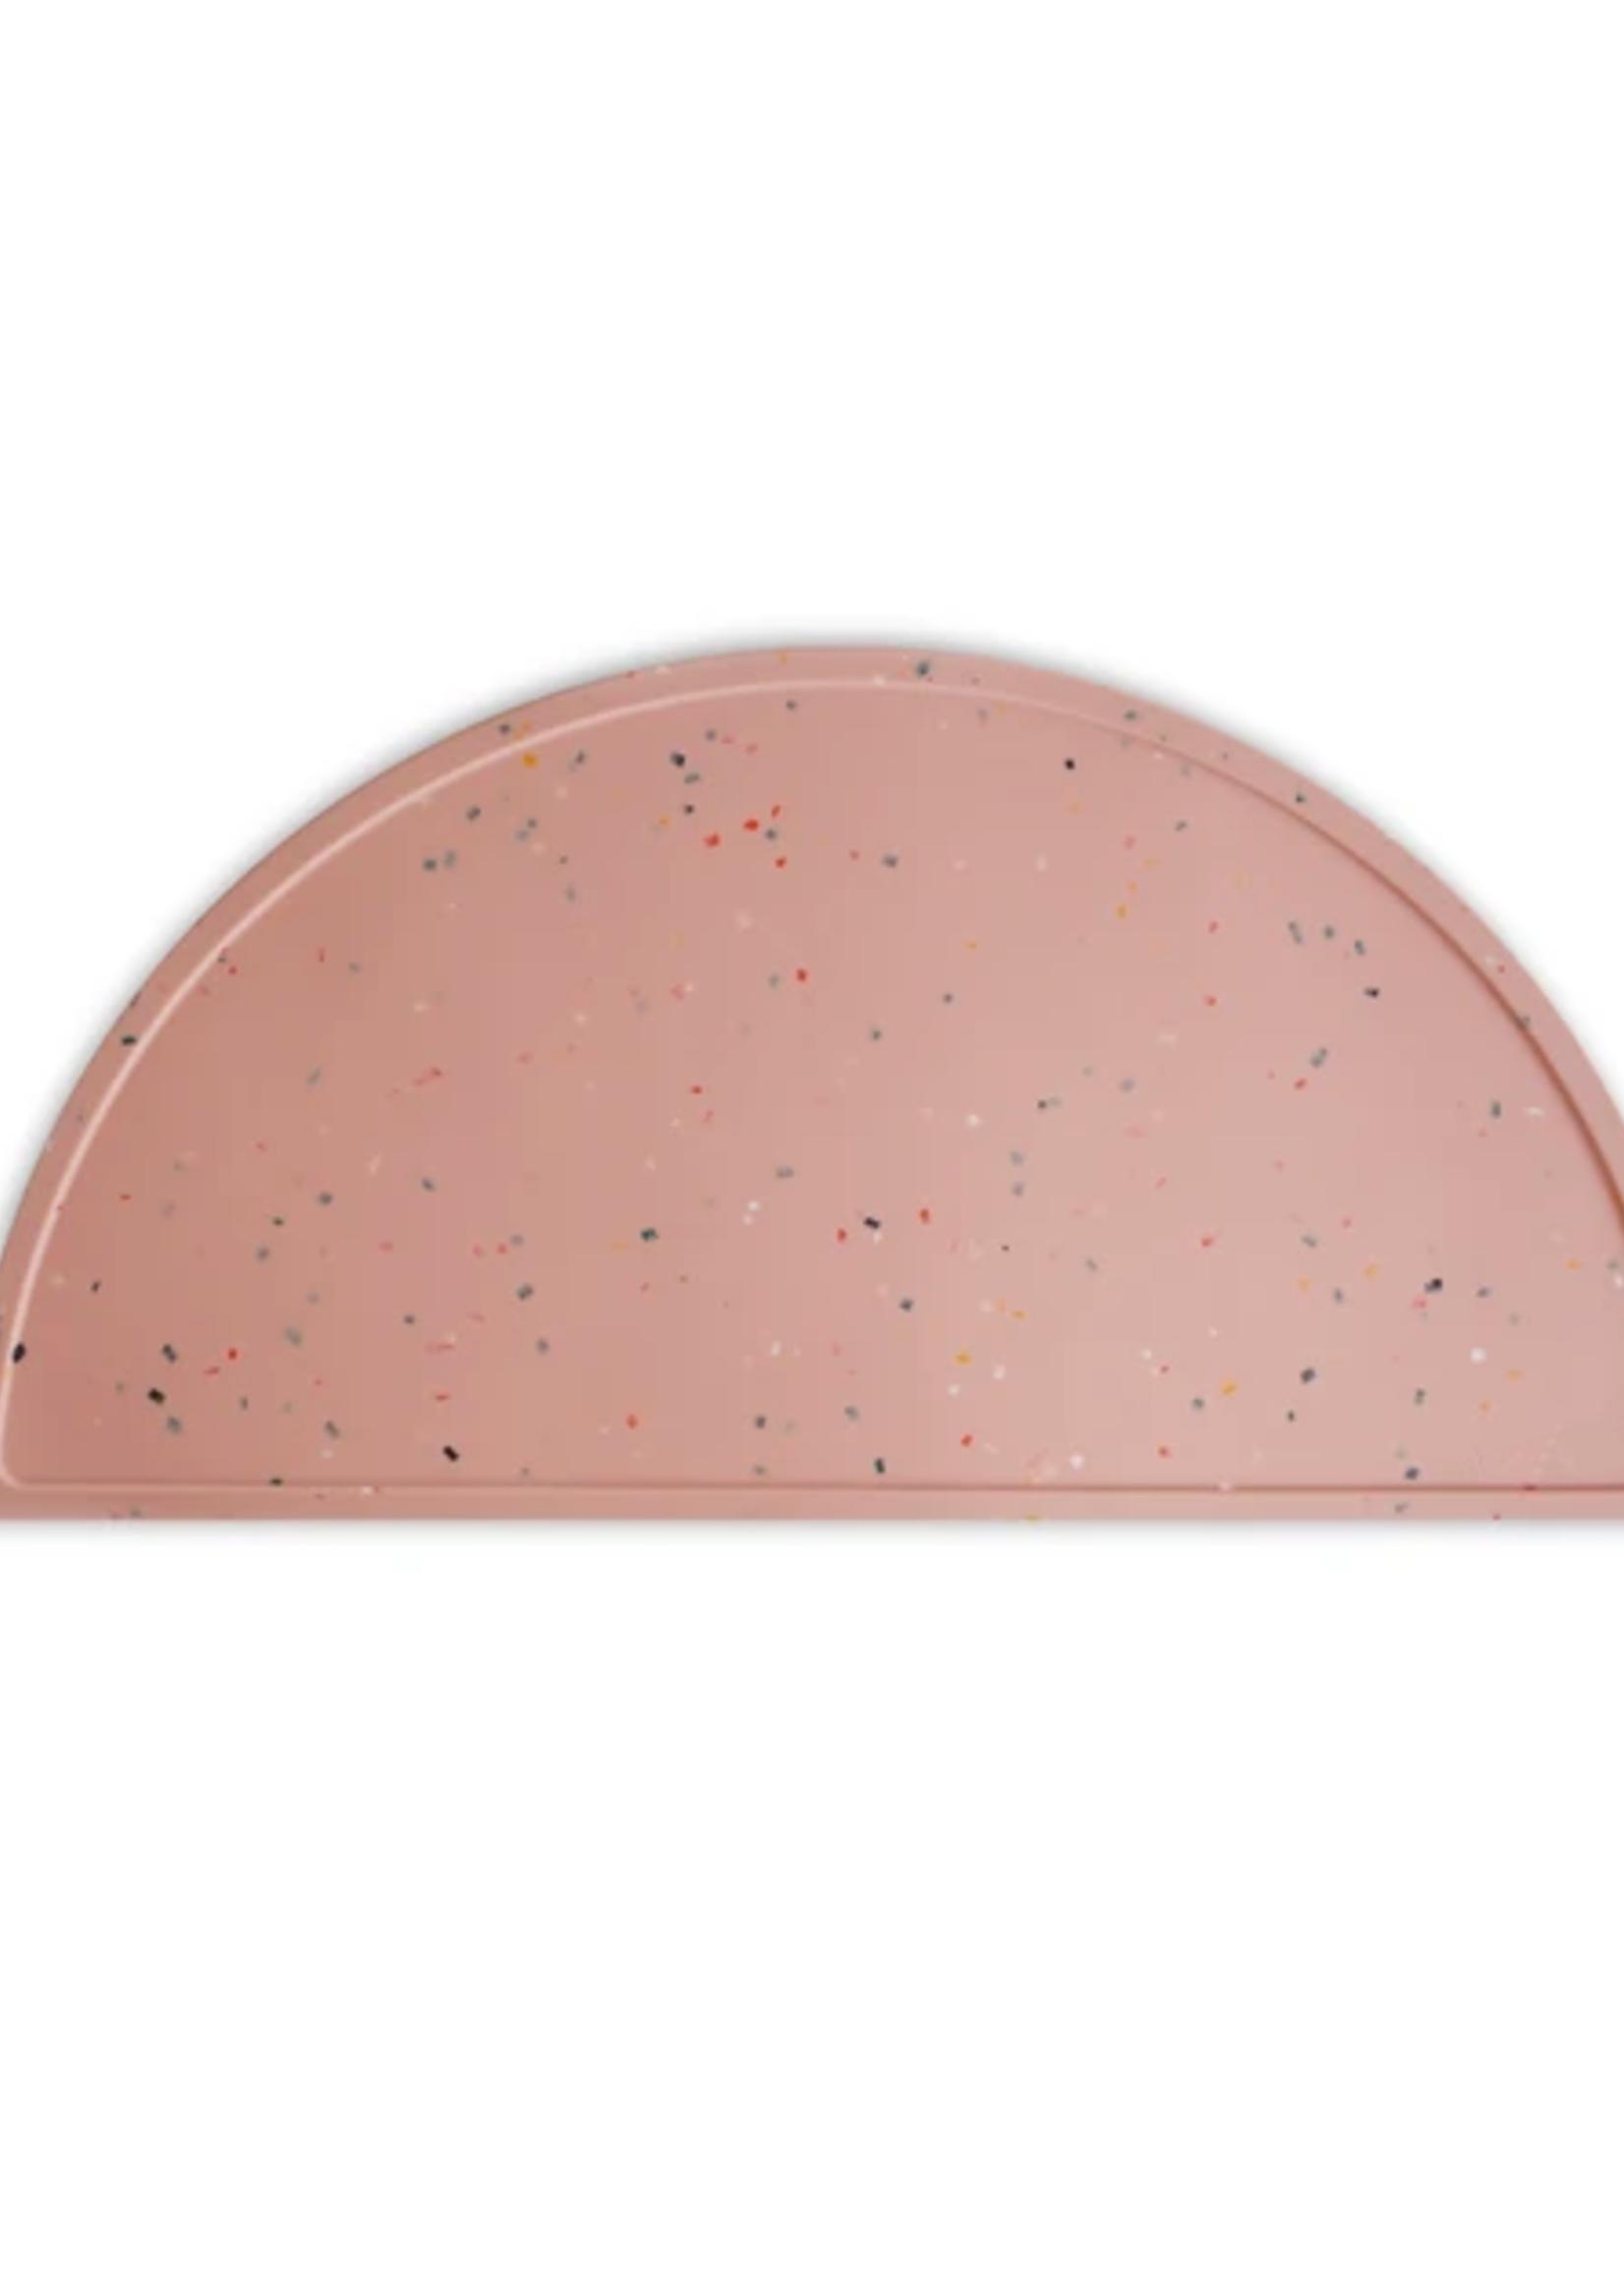 Elitaire Petite Pink Confetti Silicone Place Mat